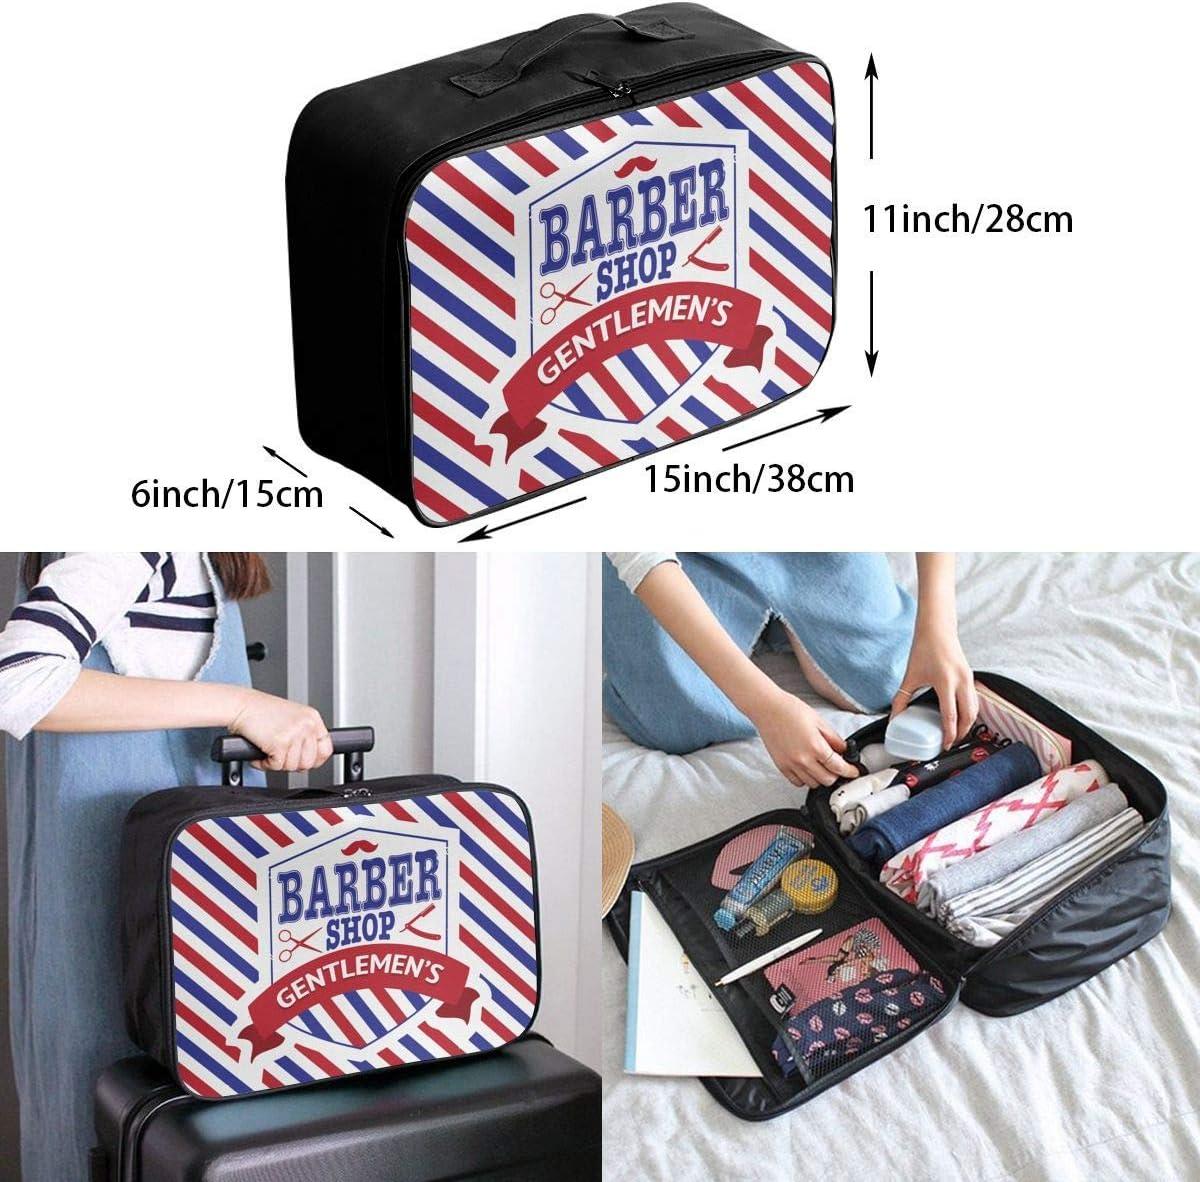 Vintage Emblem Of Barber Shop Flag 3D printed Borse da viaggio,Tote da viaggioTravel Lightweight Waterproof Foldable Storage Carry Luggage Duffle Tote Bag